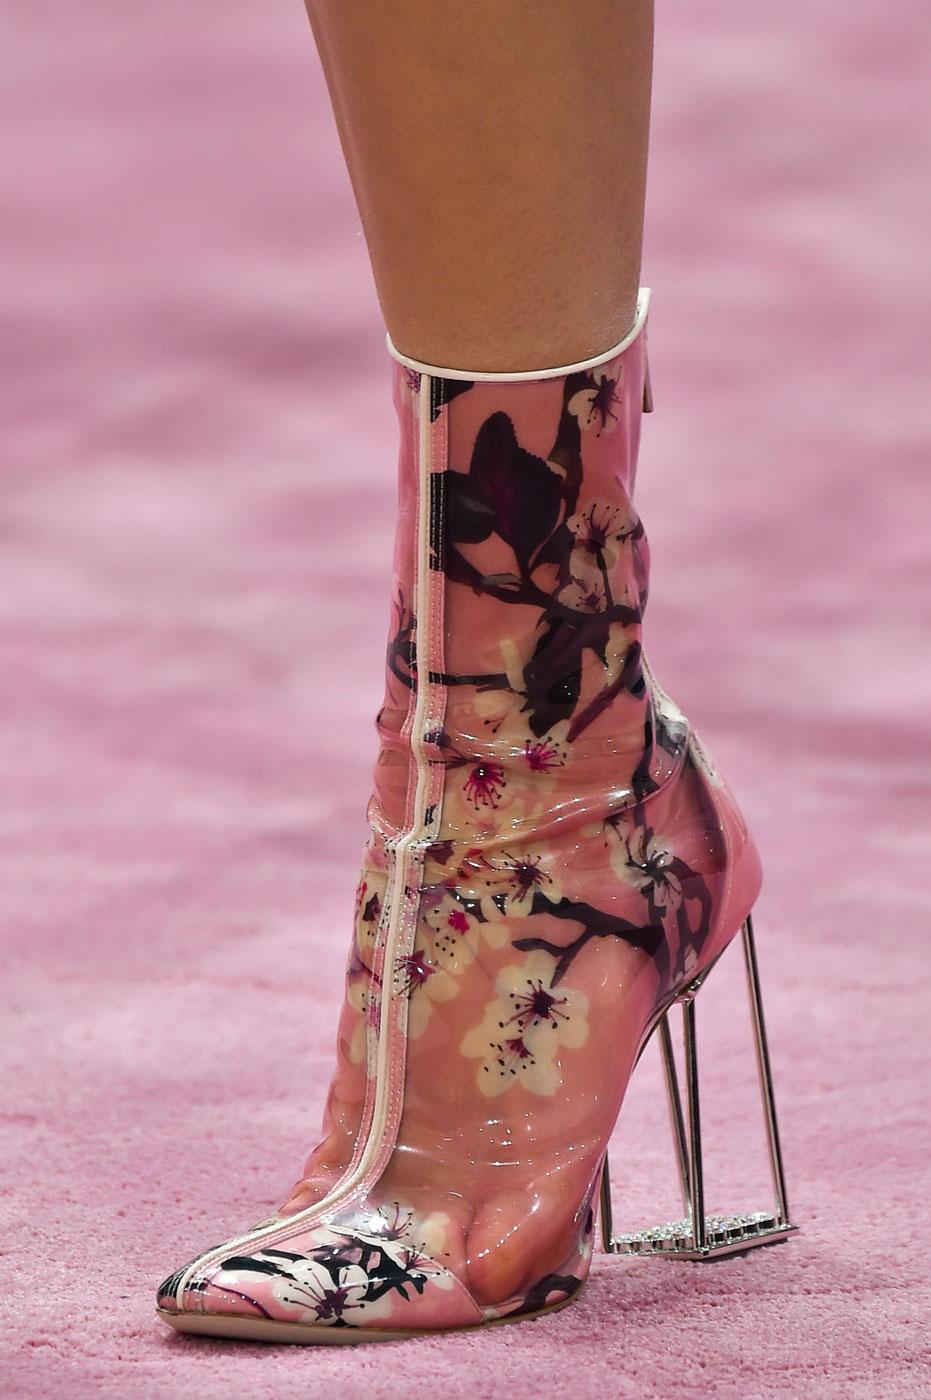 Christian-Dior-fashion-runway-show-close-ups-haute-couture-paris-spring-summer-2015-the-impression-163